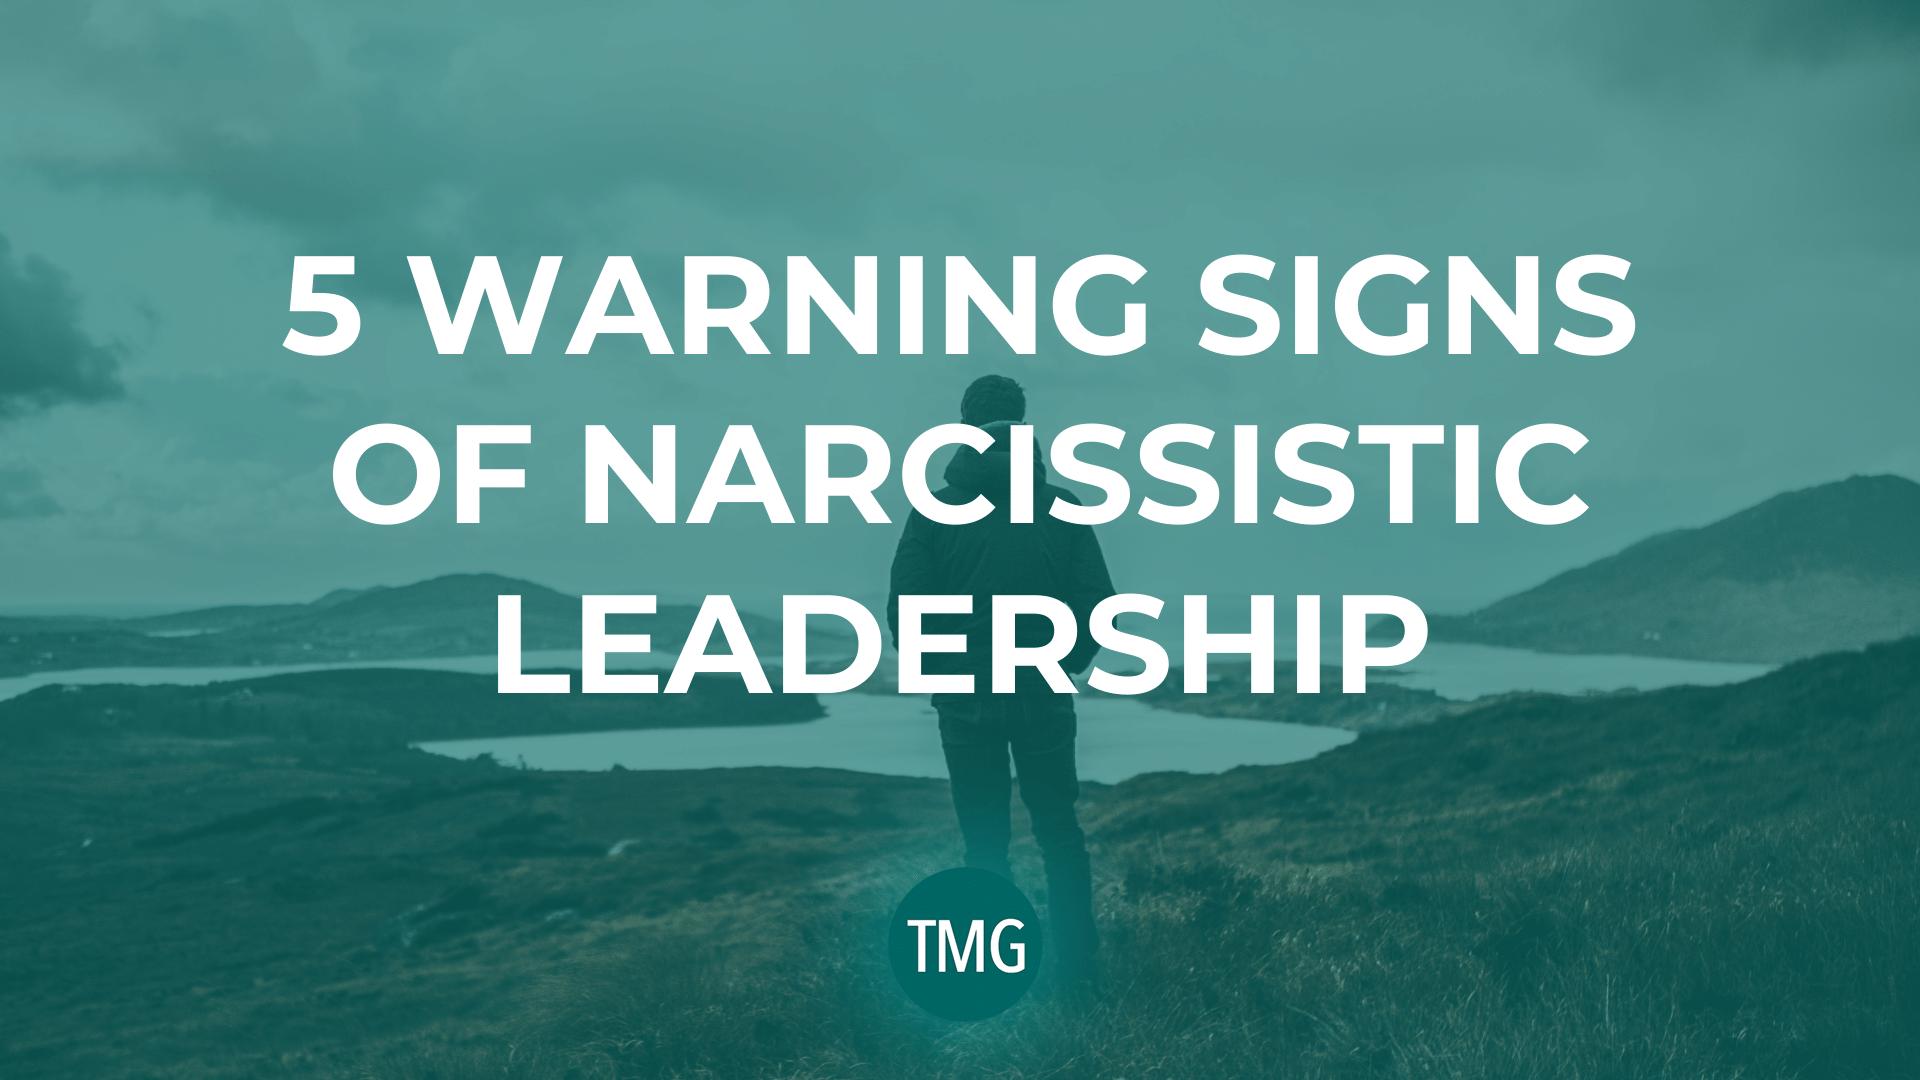 5-warning-signs-of-narcissistic-leadership-leader-image